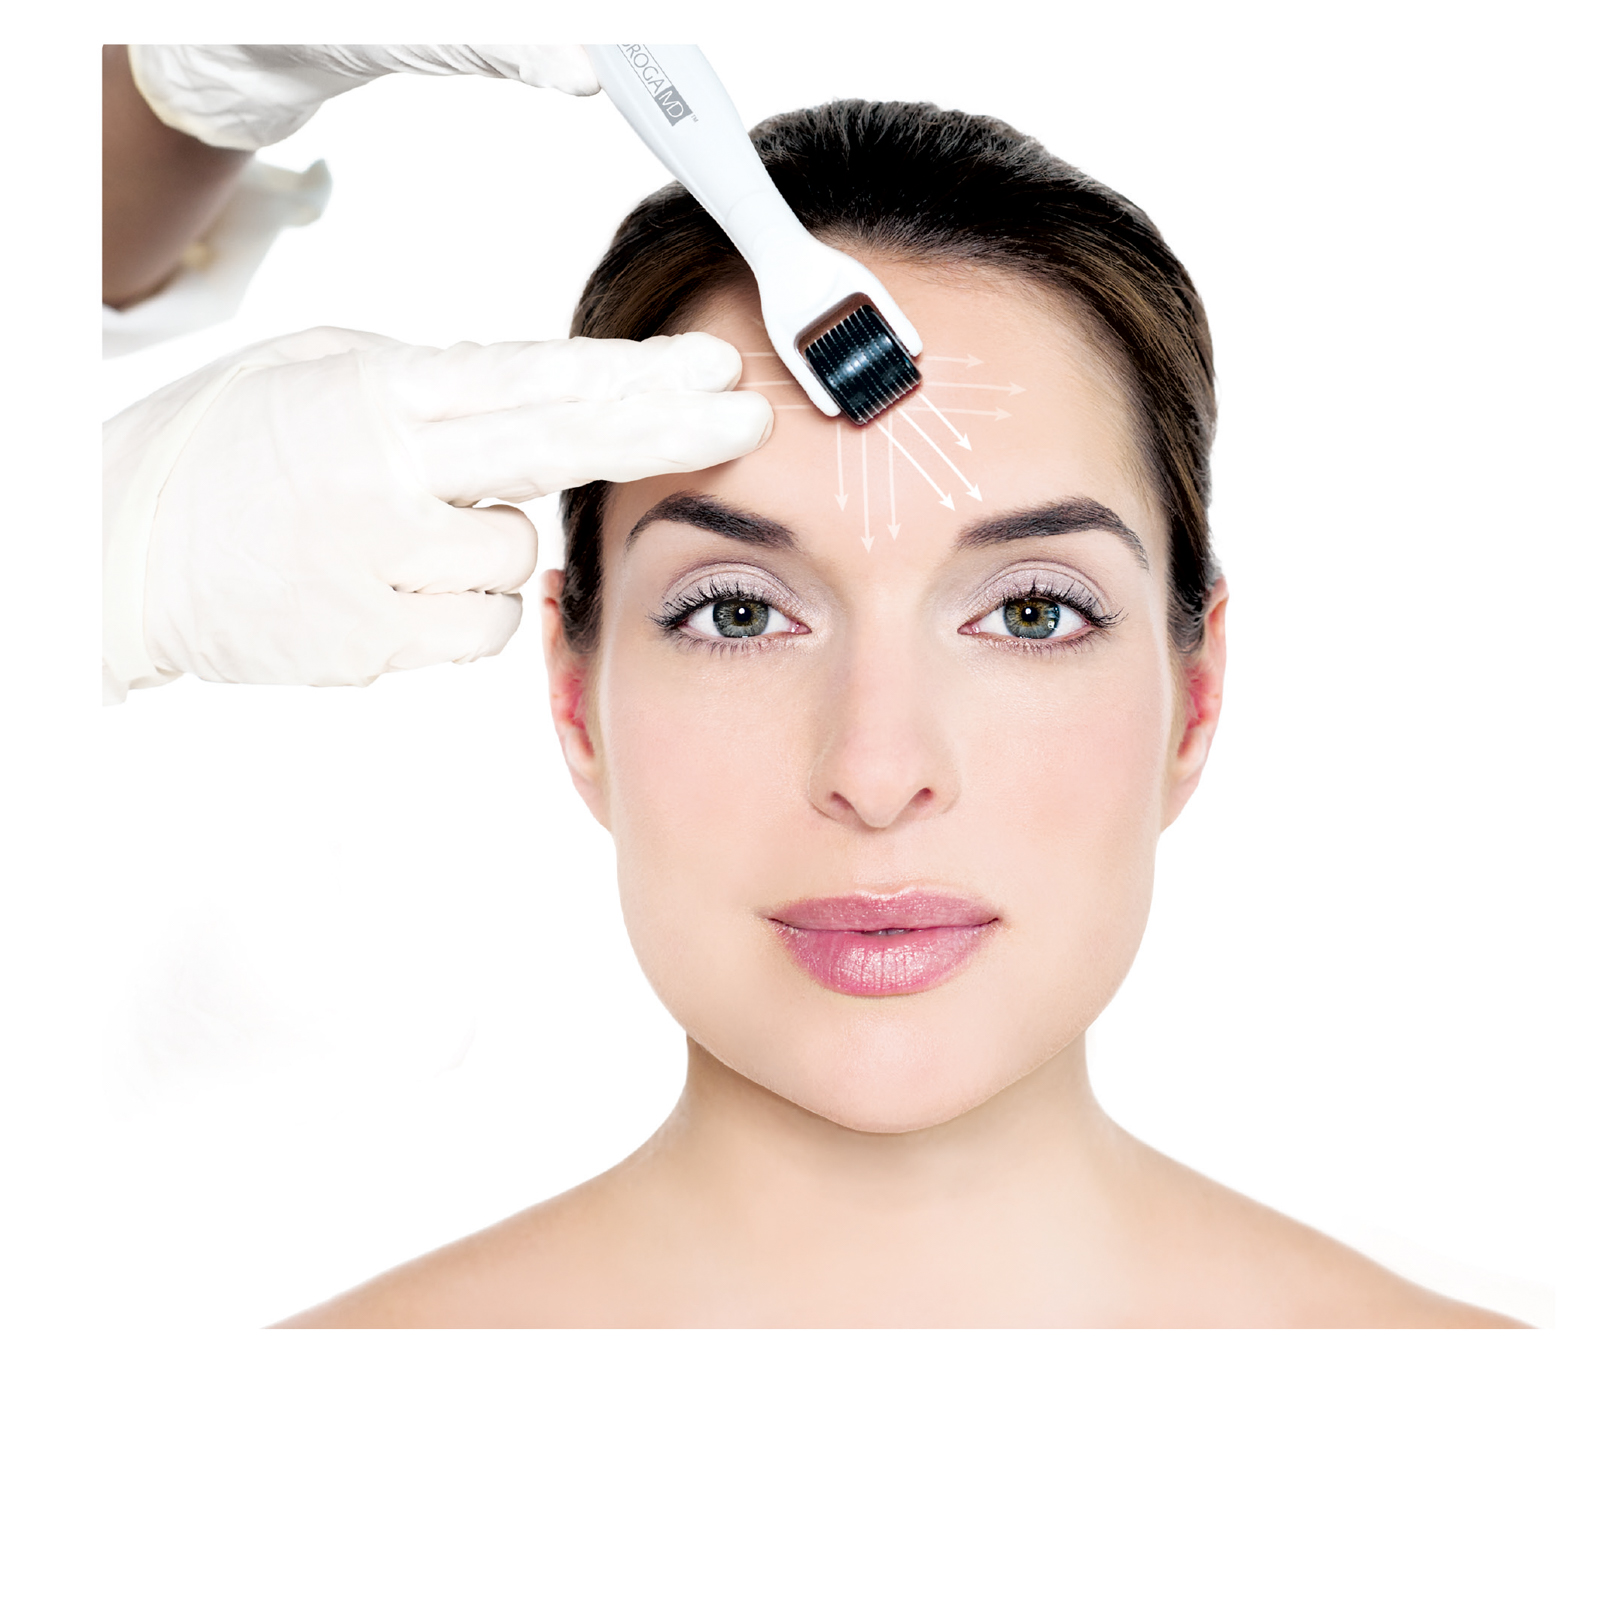 BIODROGA - Medical Beauty und SkinCare by Redröh Beauty & Care professional